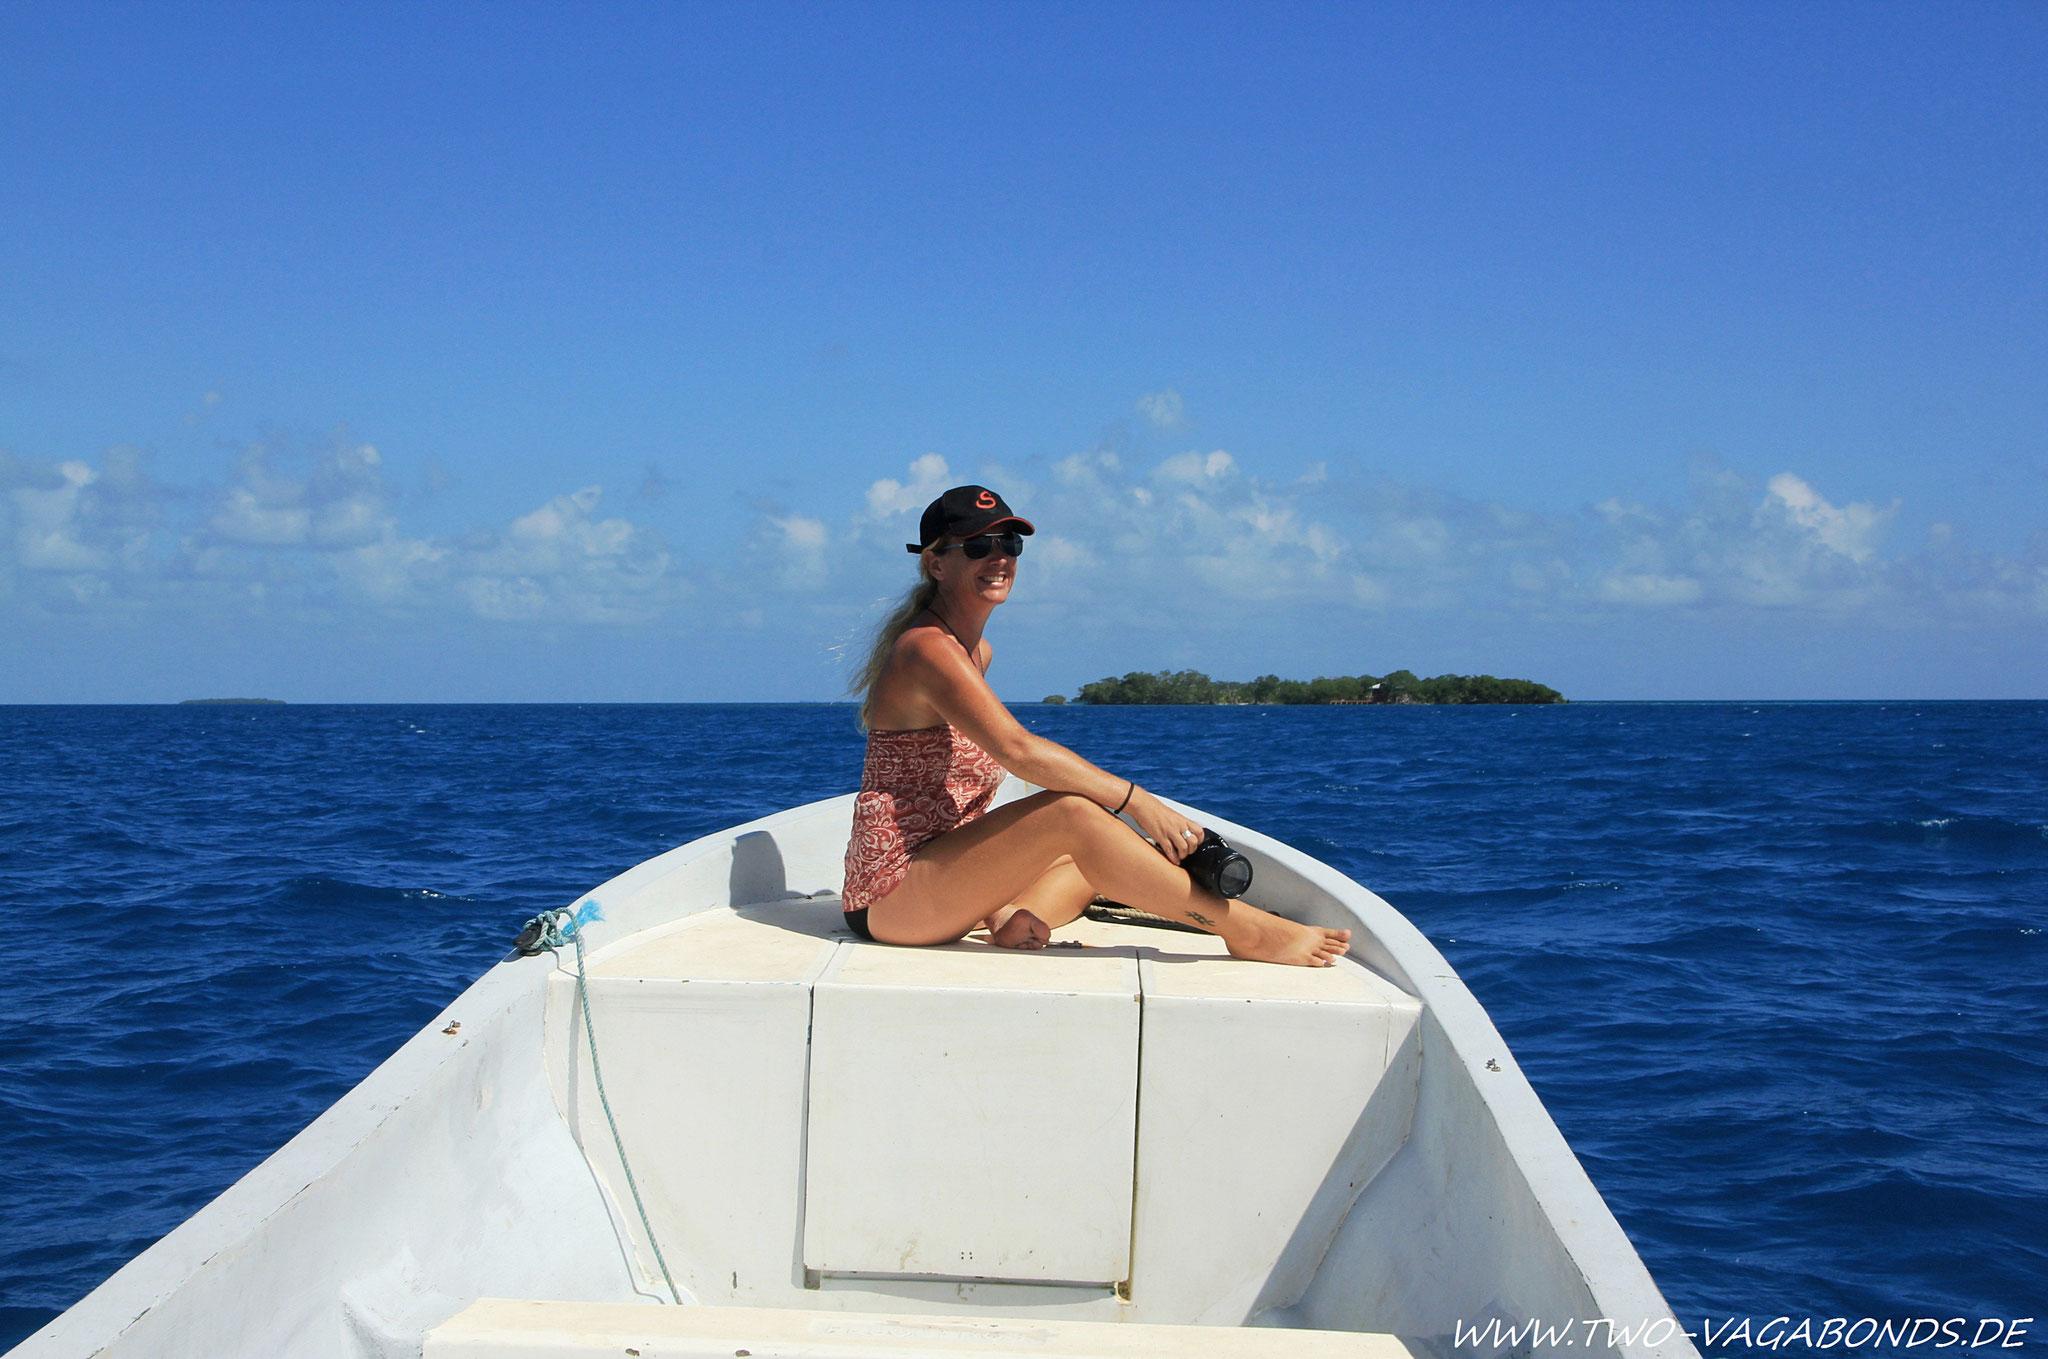 BELIZE 2013 - KARIBIK - LITTLE PETER ISLAND